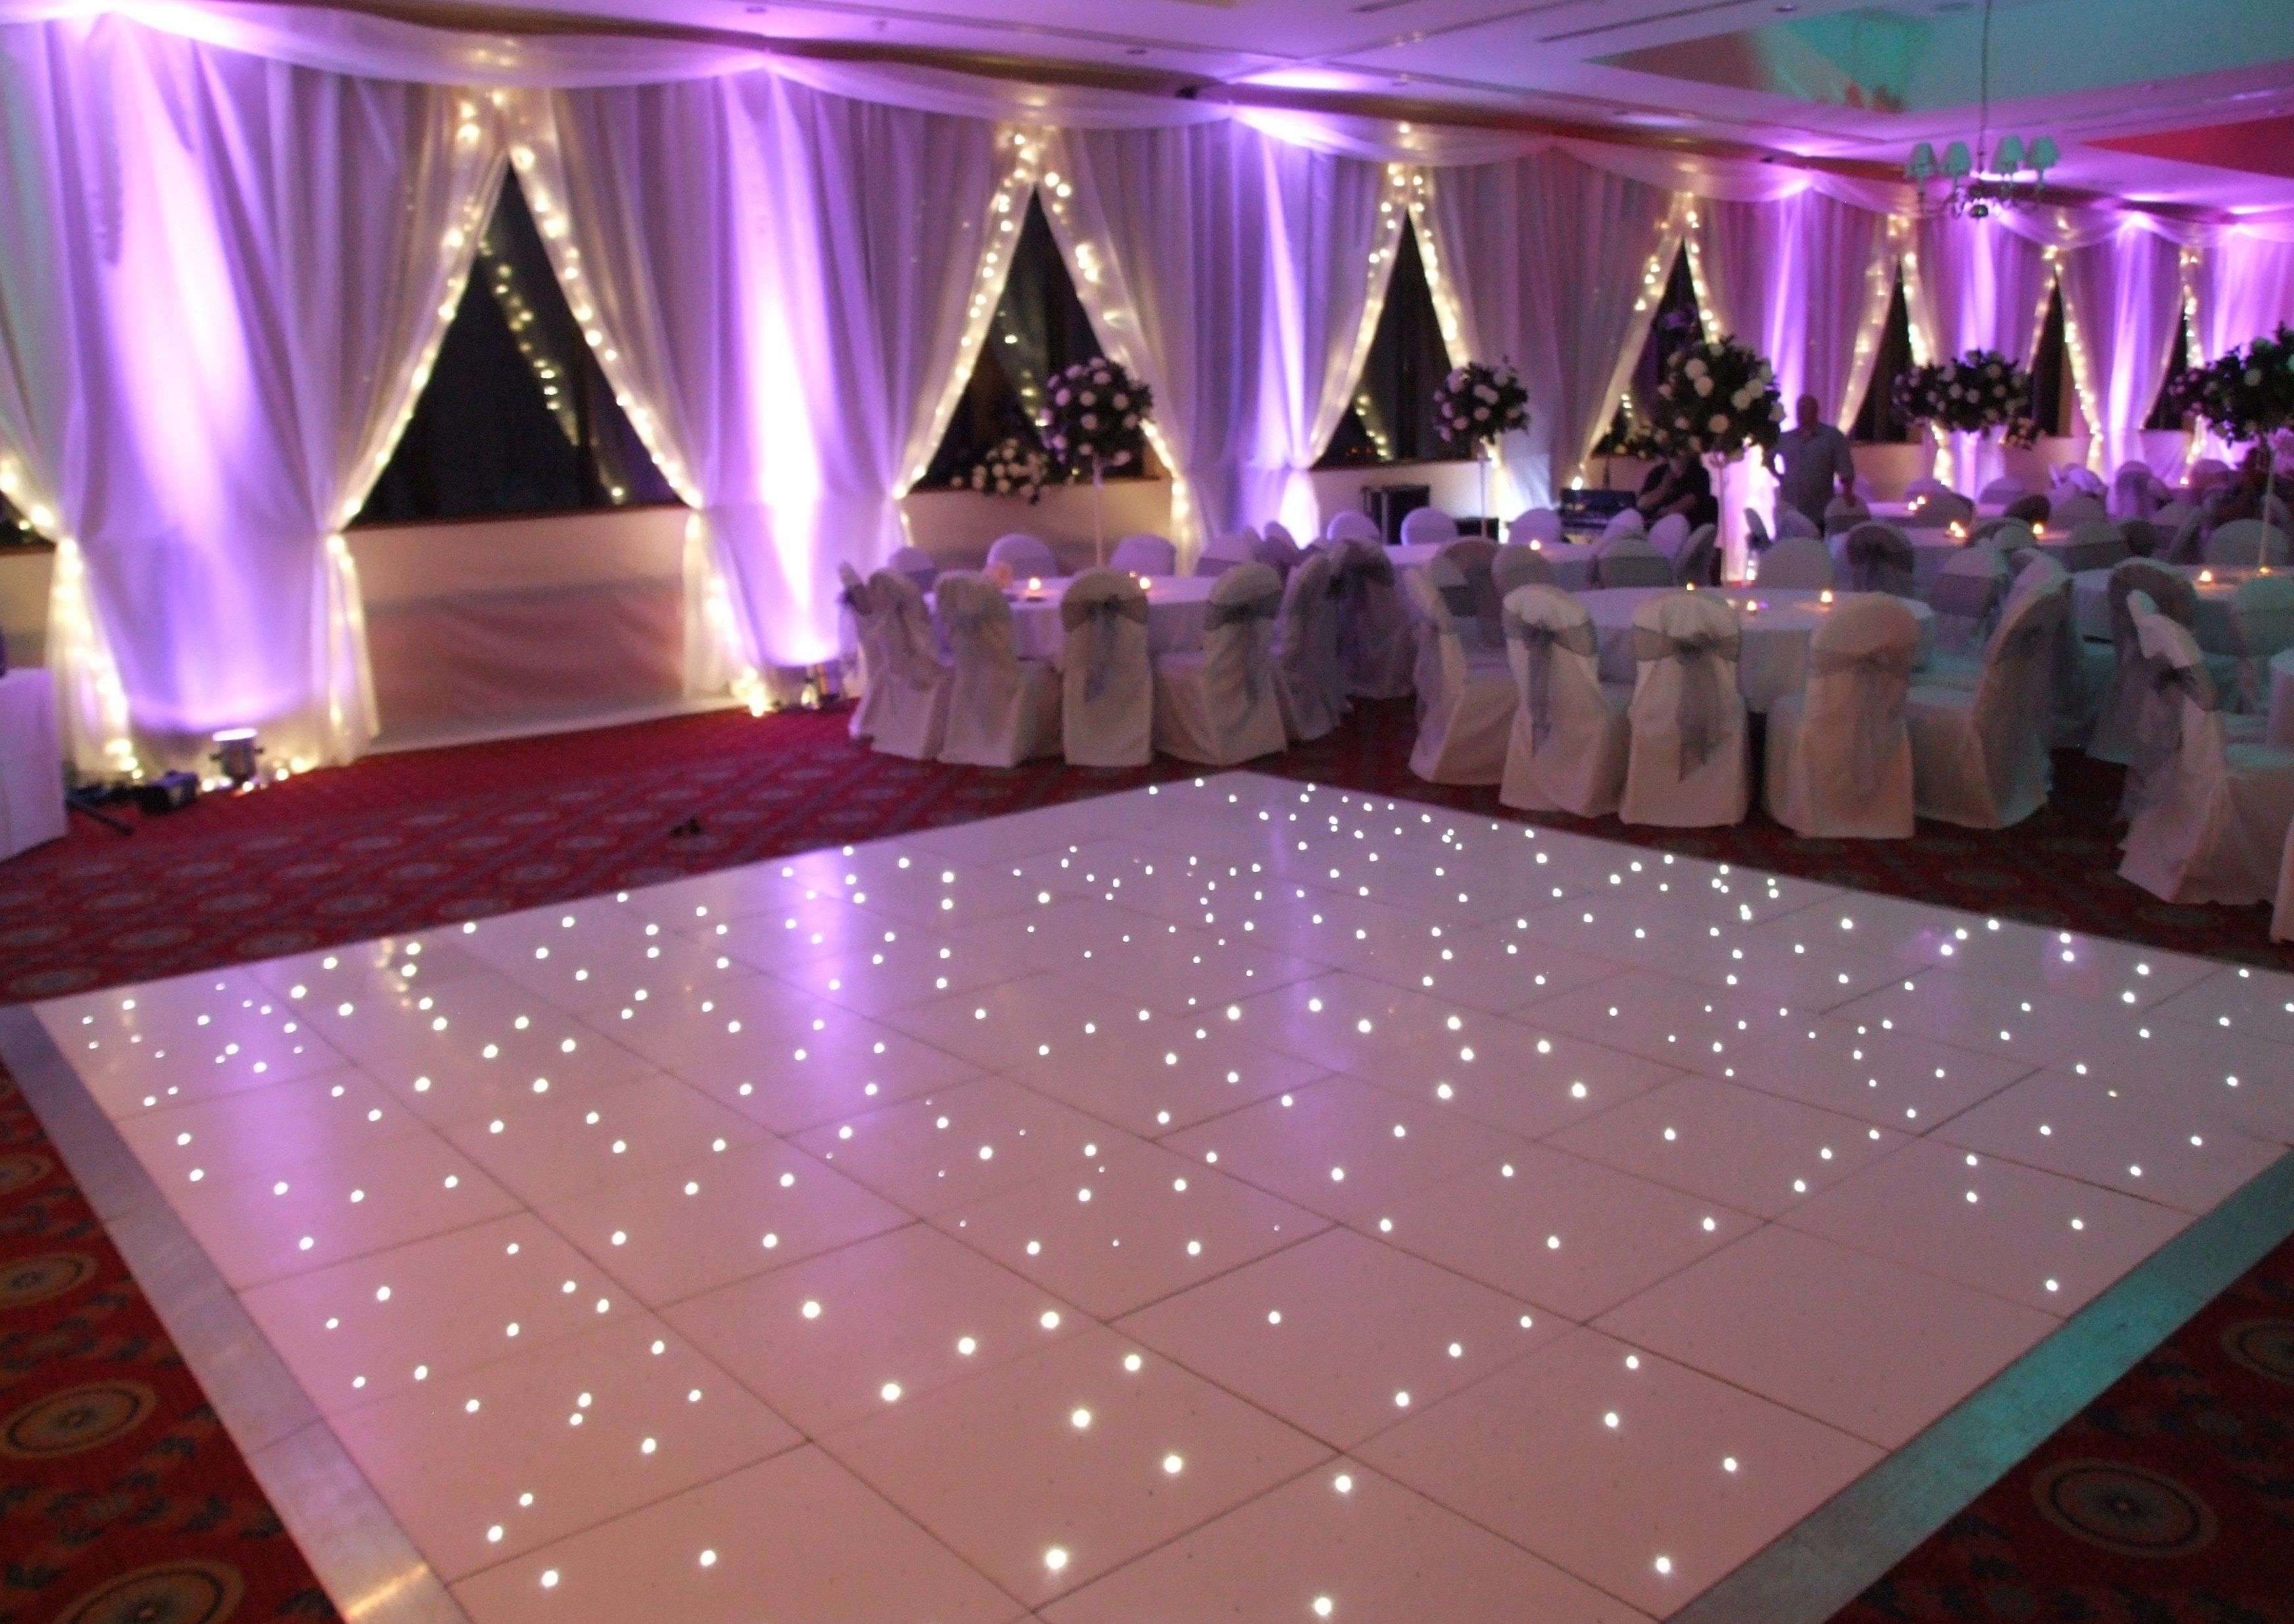 Wedding Decorations Ideas Pinterest In 2020 Wedding Backyard Decorations Dance Floor Wedding Wedding Reception Decorations